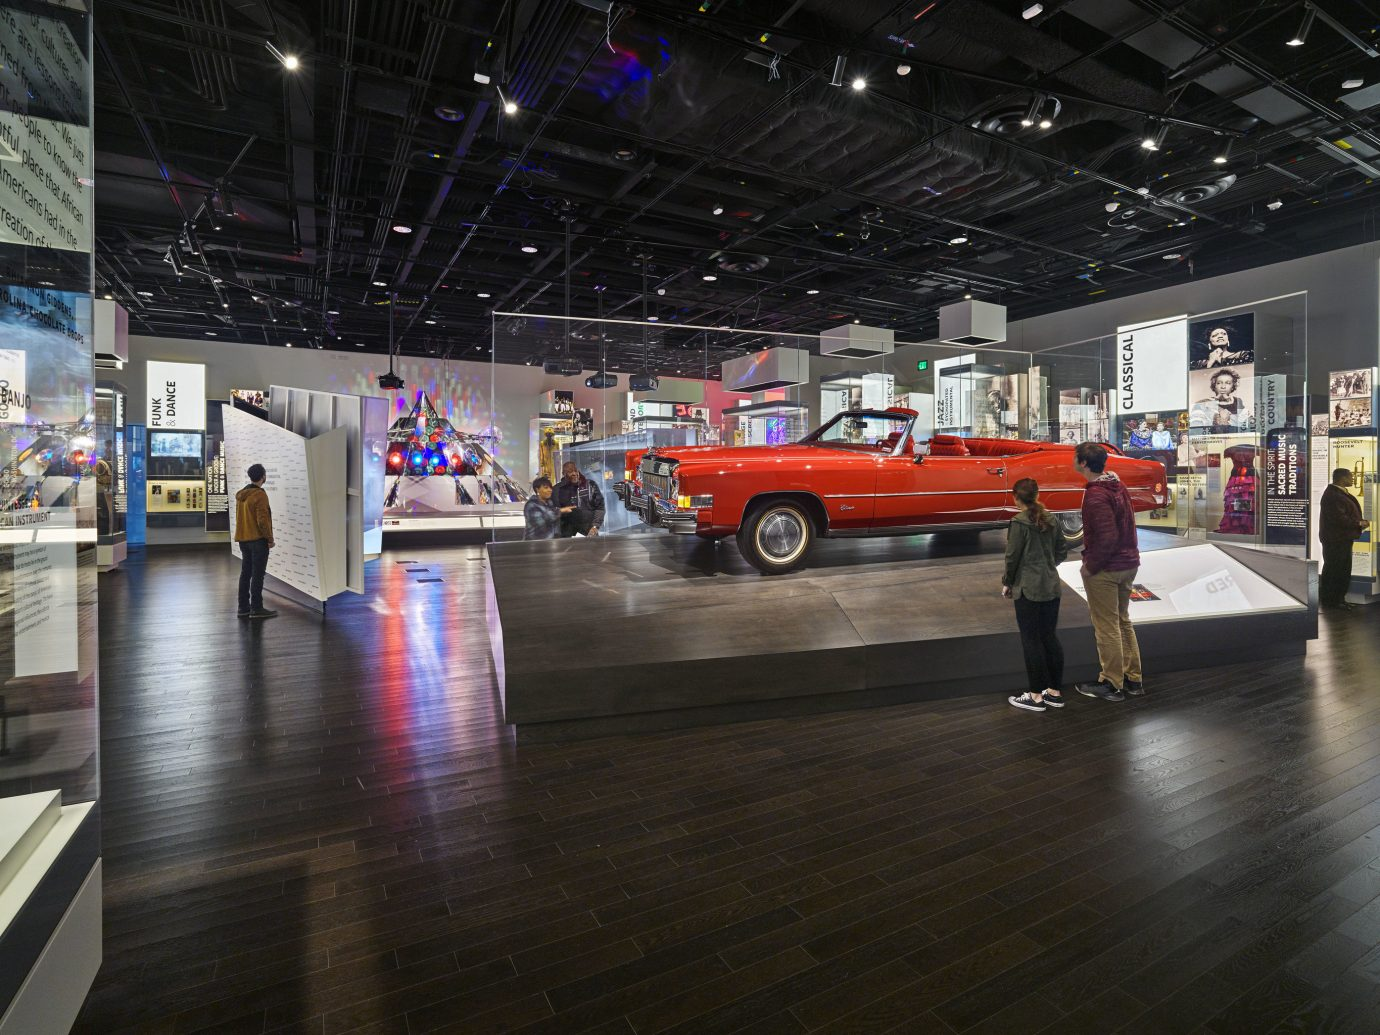 Trip Ideas indoor car floor auto show motor vehicle automotive design exhibition ceiling vehicle tourist attraction luxury vehicle compact car several